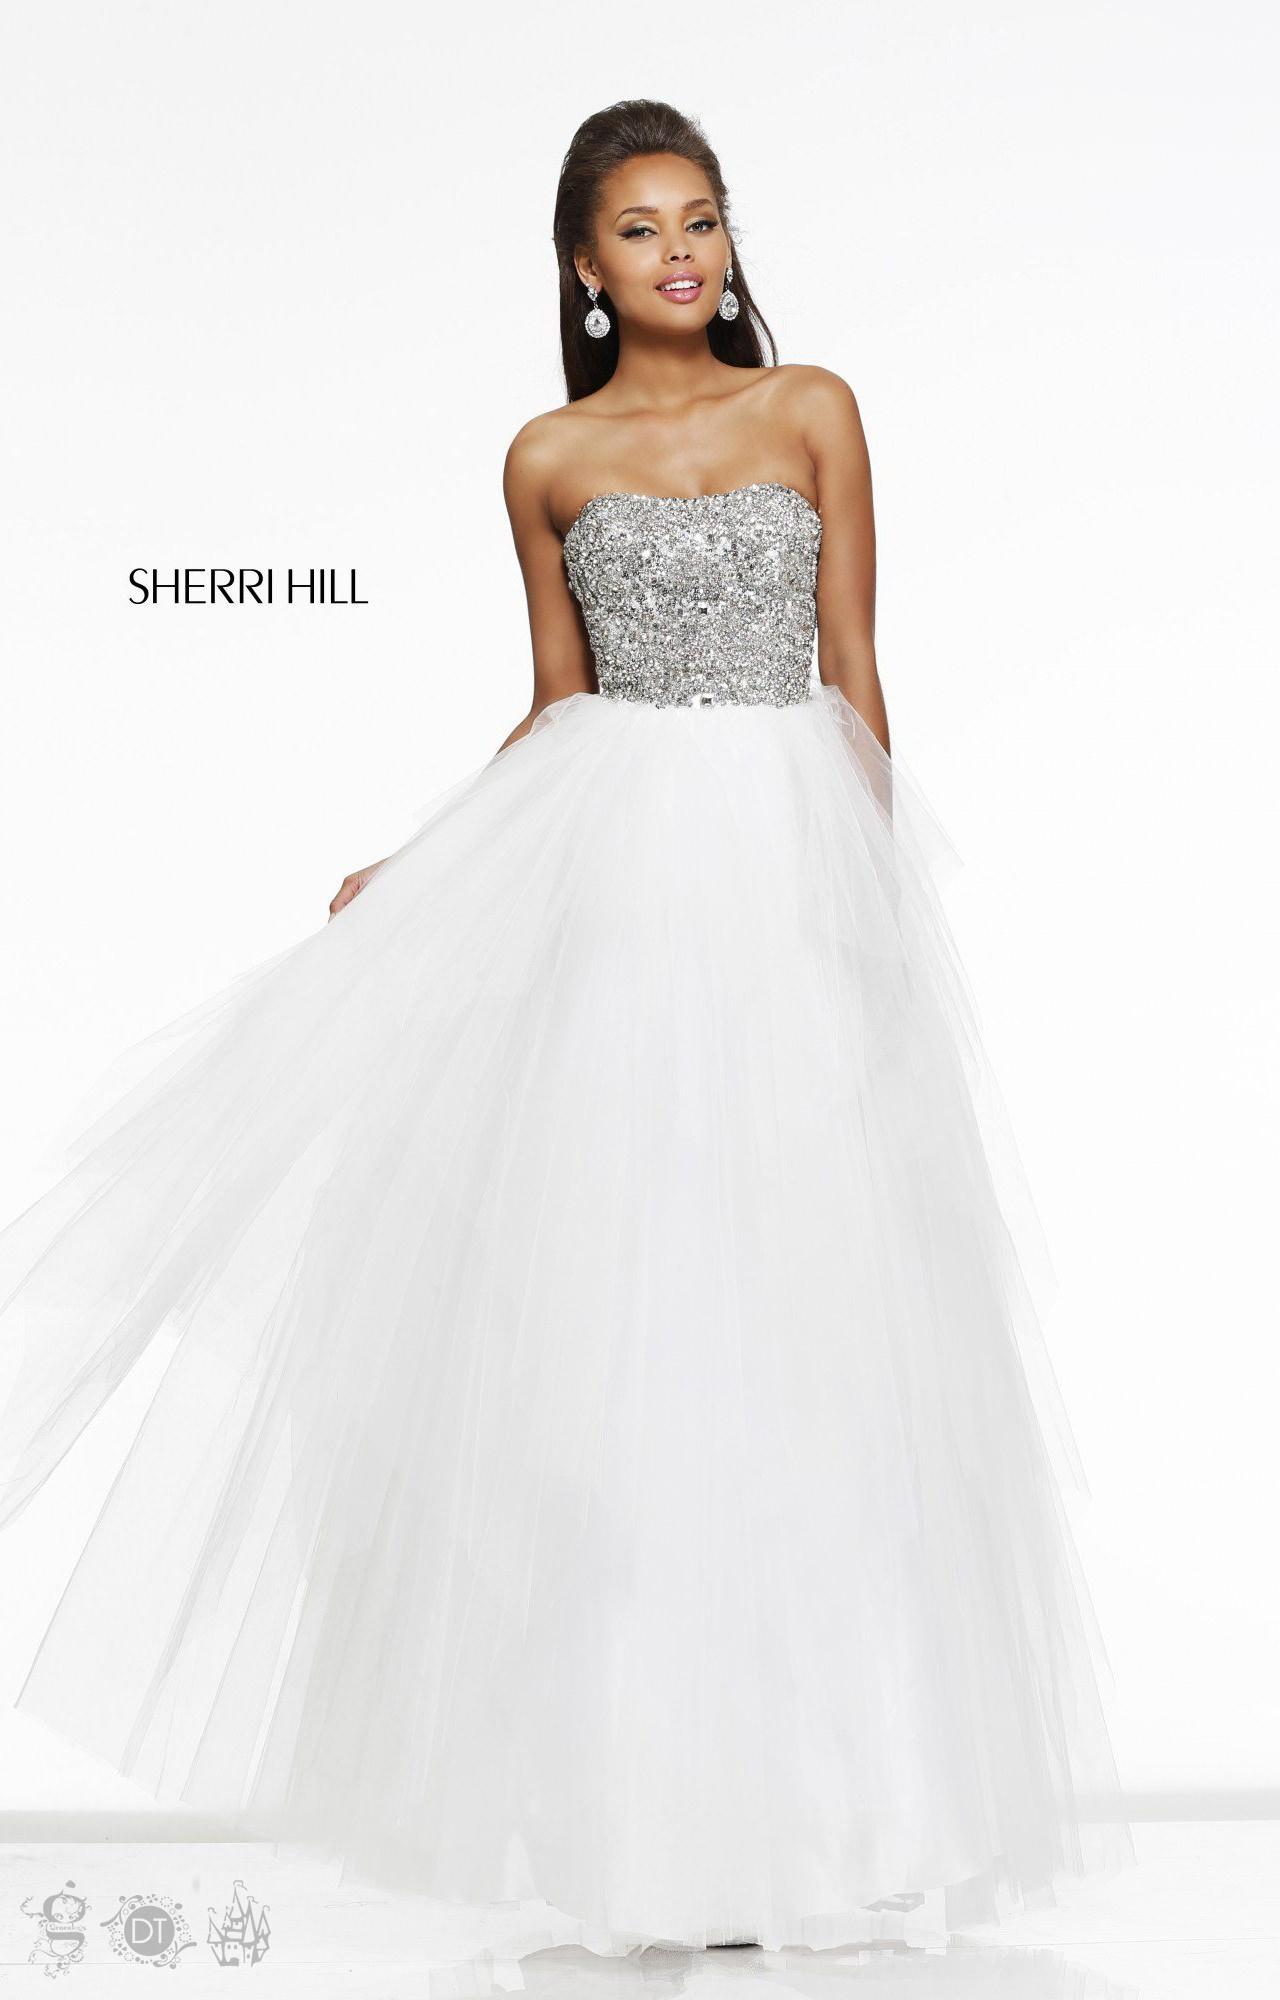 Sherri Hill 11085 Strapless Beaded Cut Tulle Ball Gown